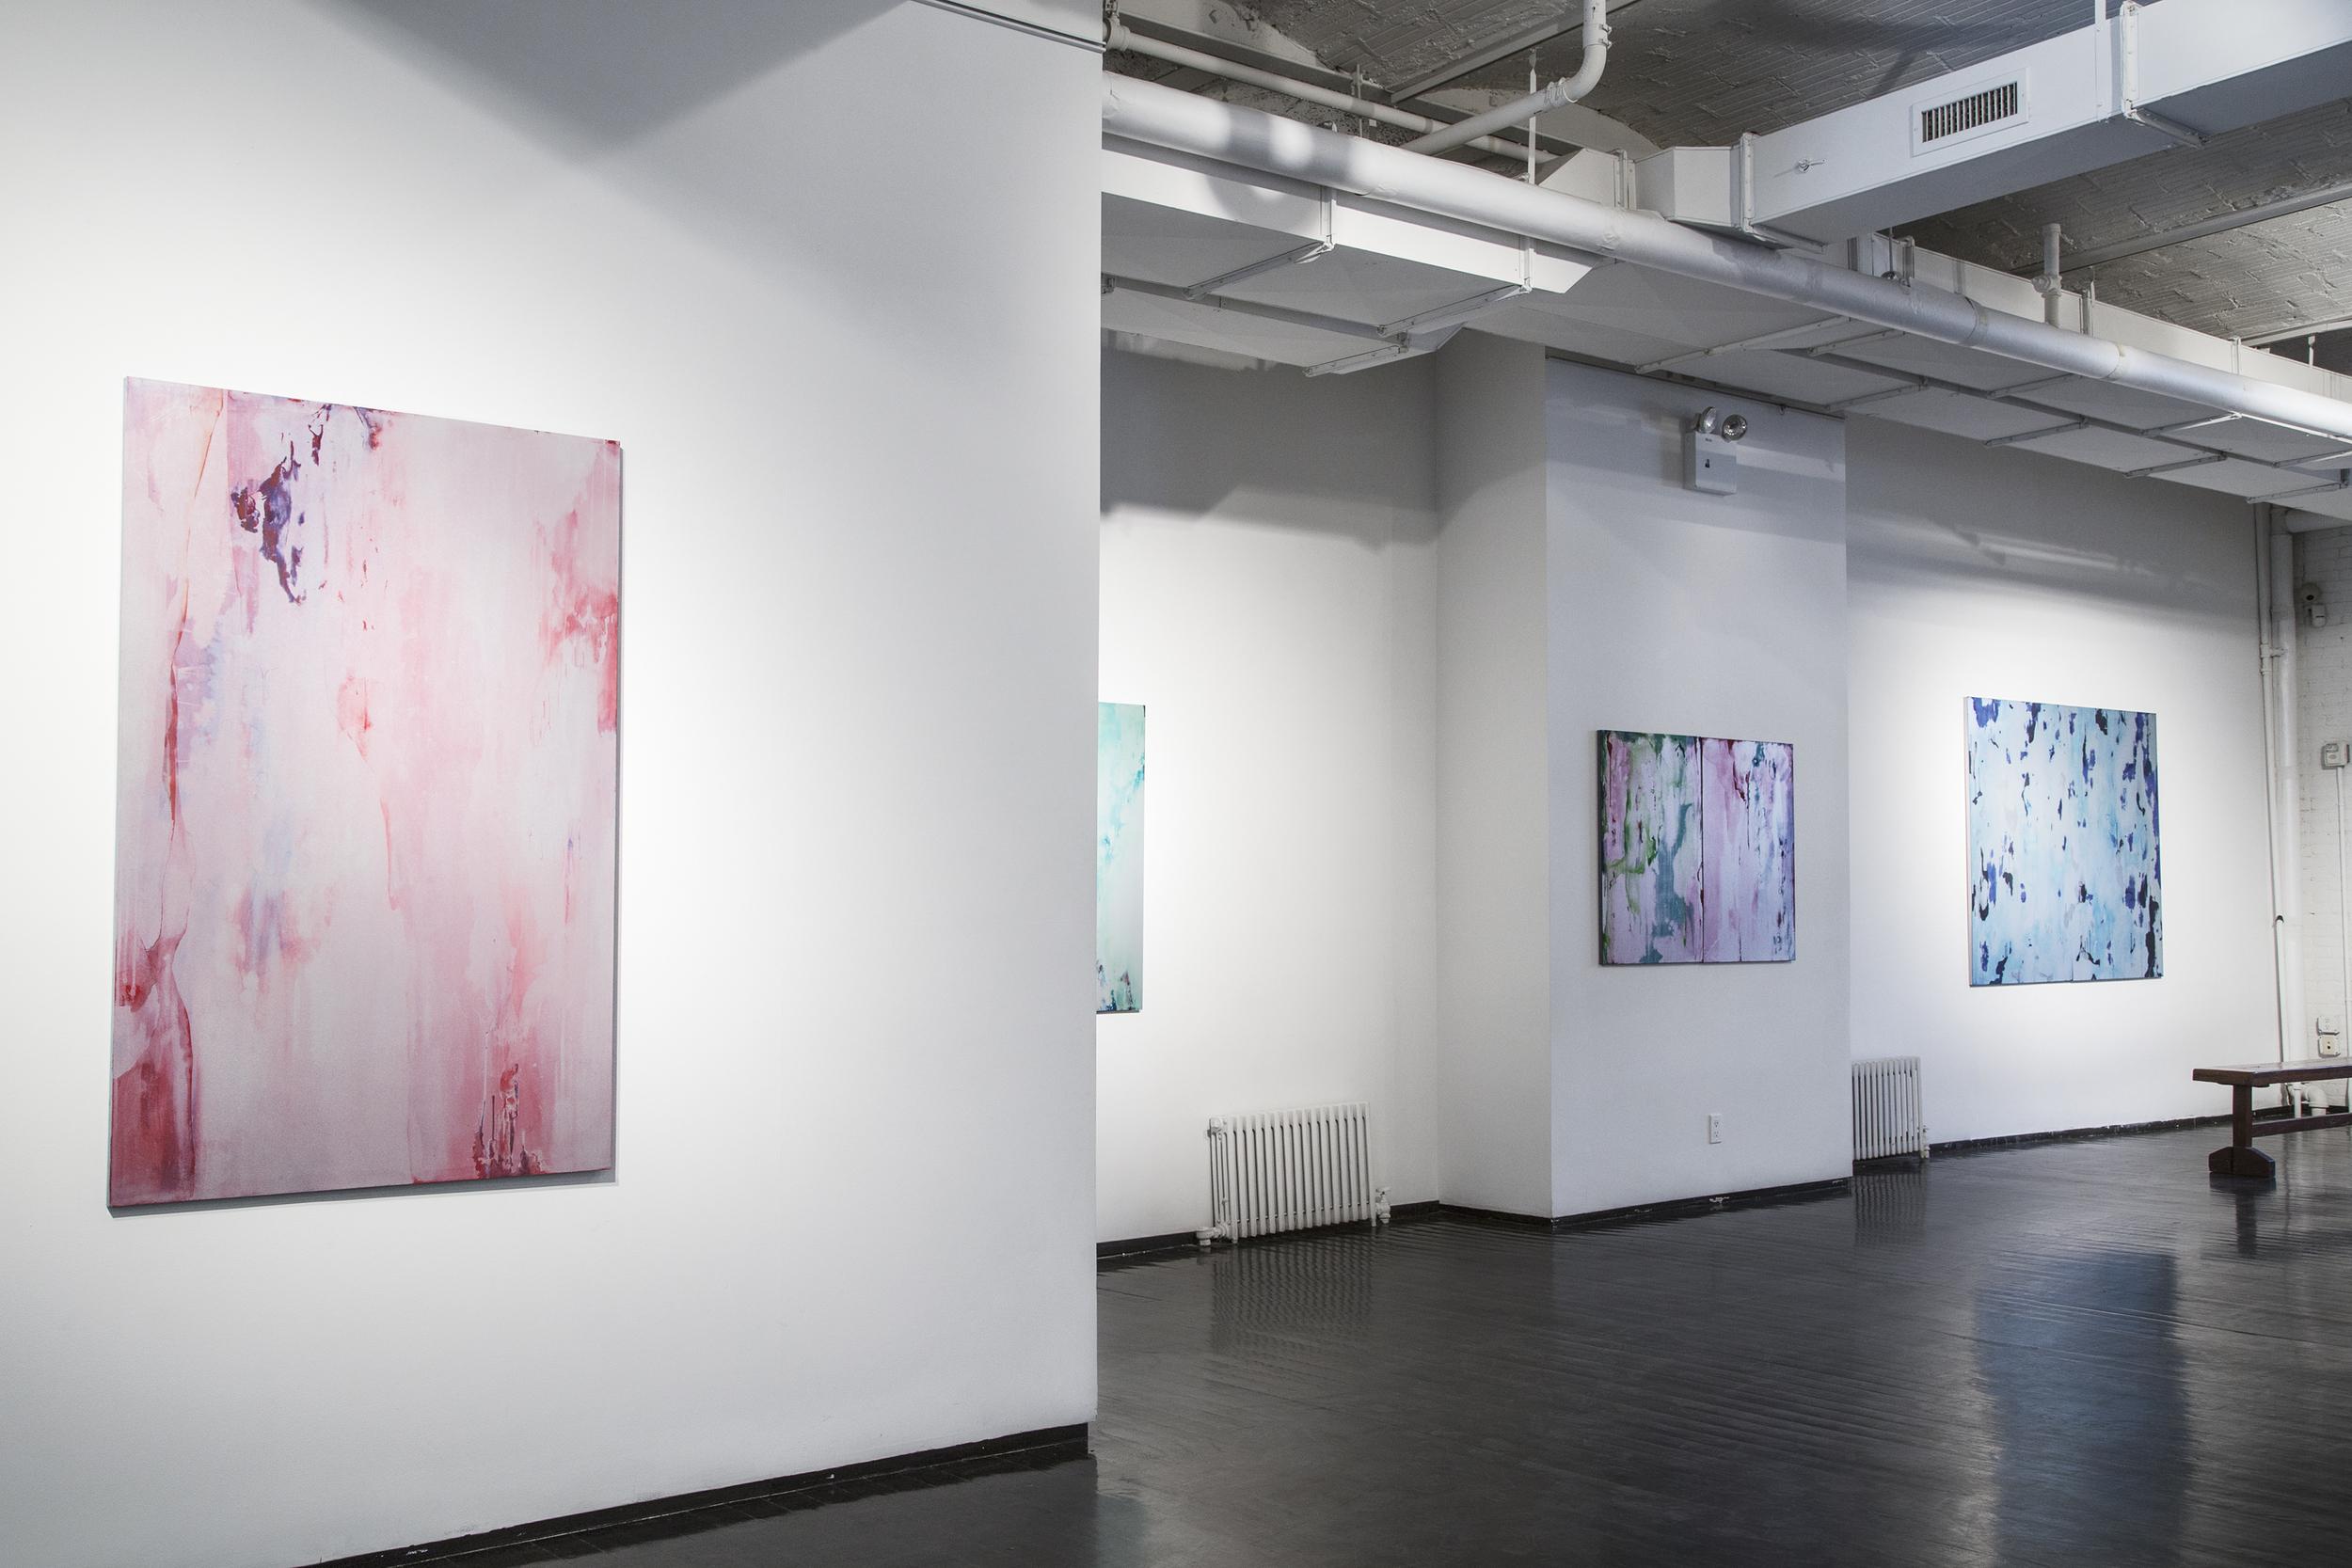 Dillon_Gallery_Yuzu_Ono_Chelsea_Exhibit_Artist.jpg